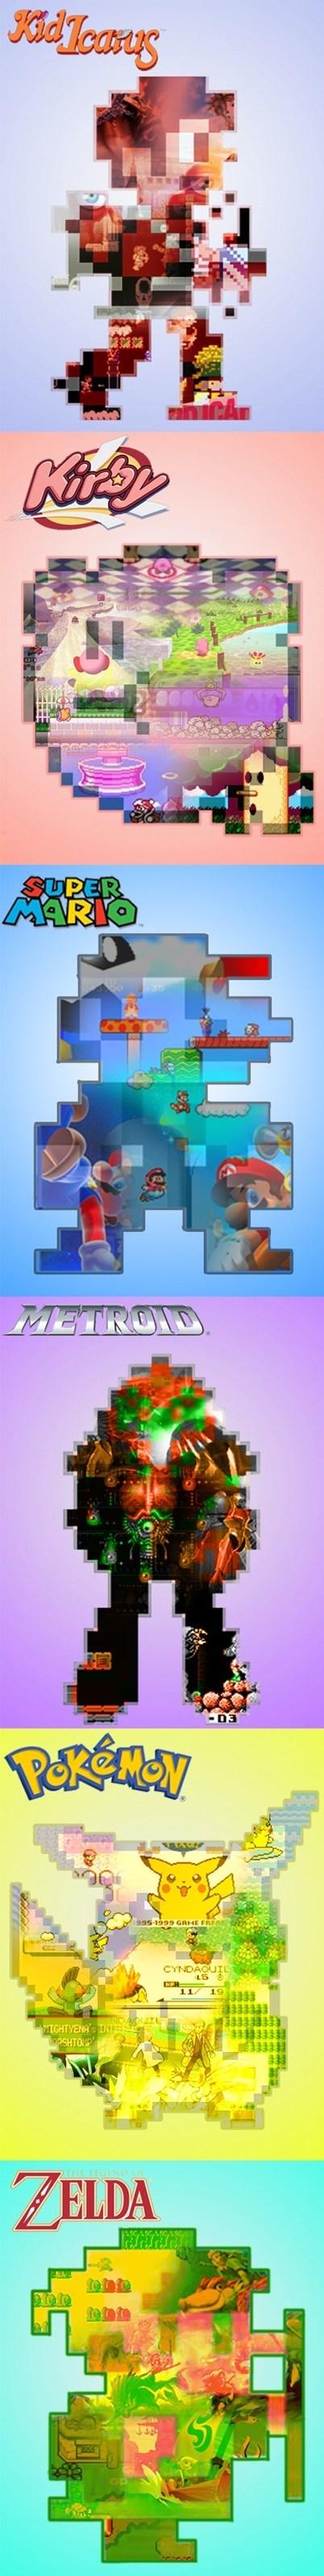 Pokémon retro kirby Metroid posters kid icarus 8 bit zelda mario nintendo